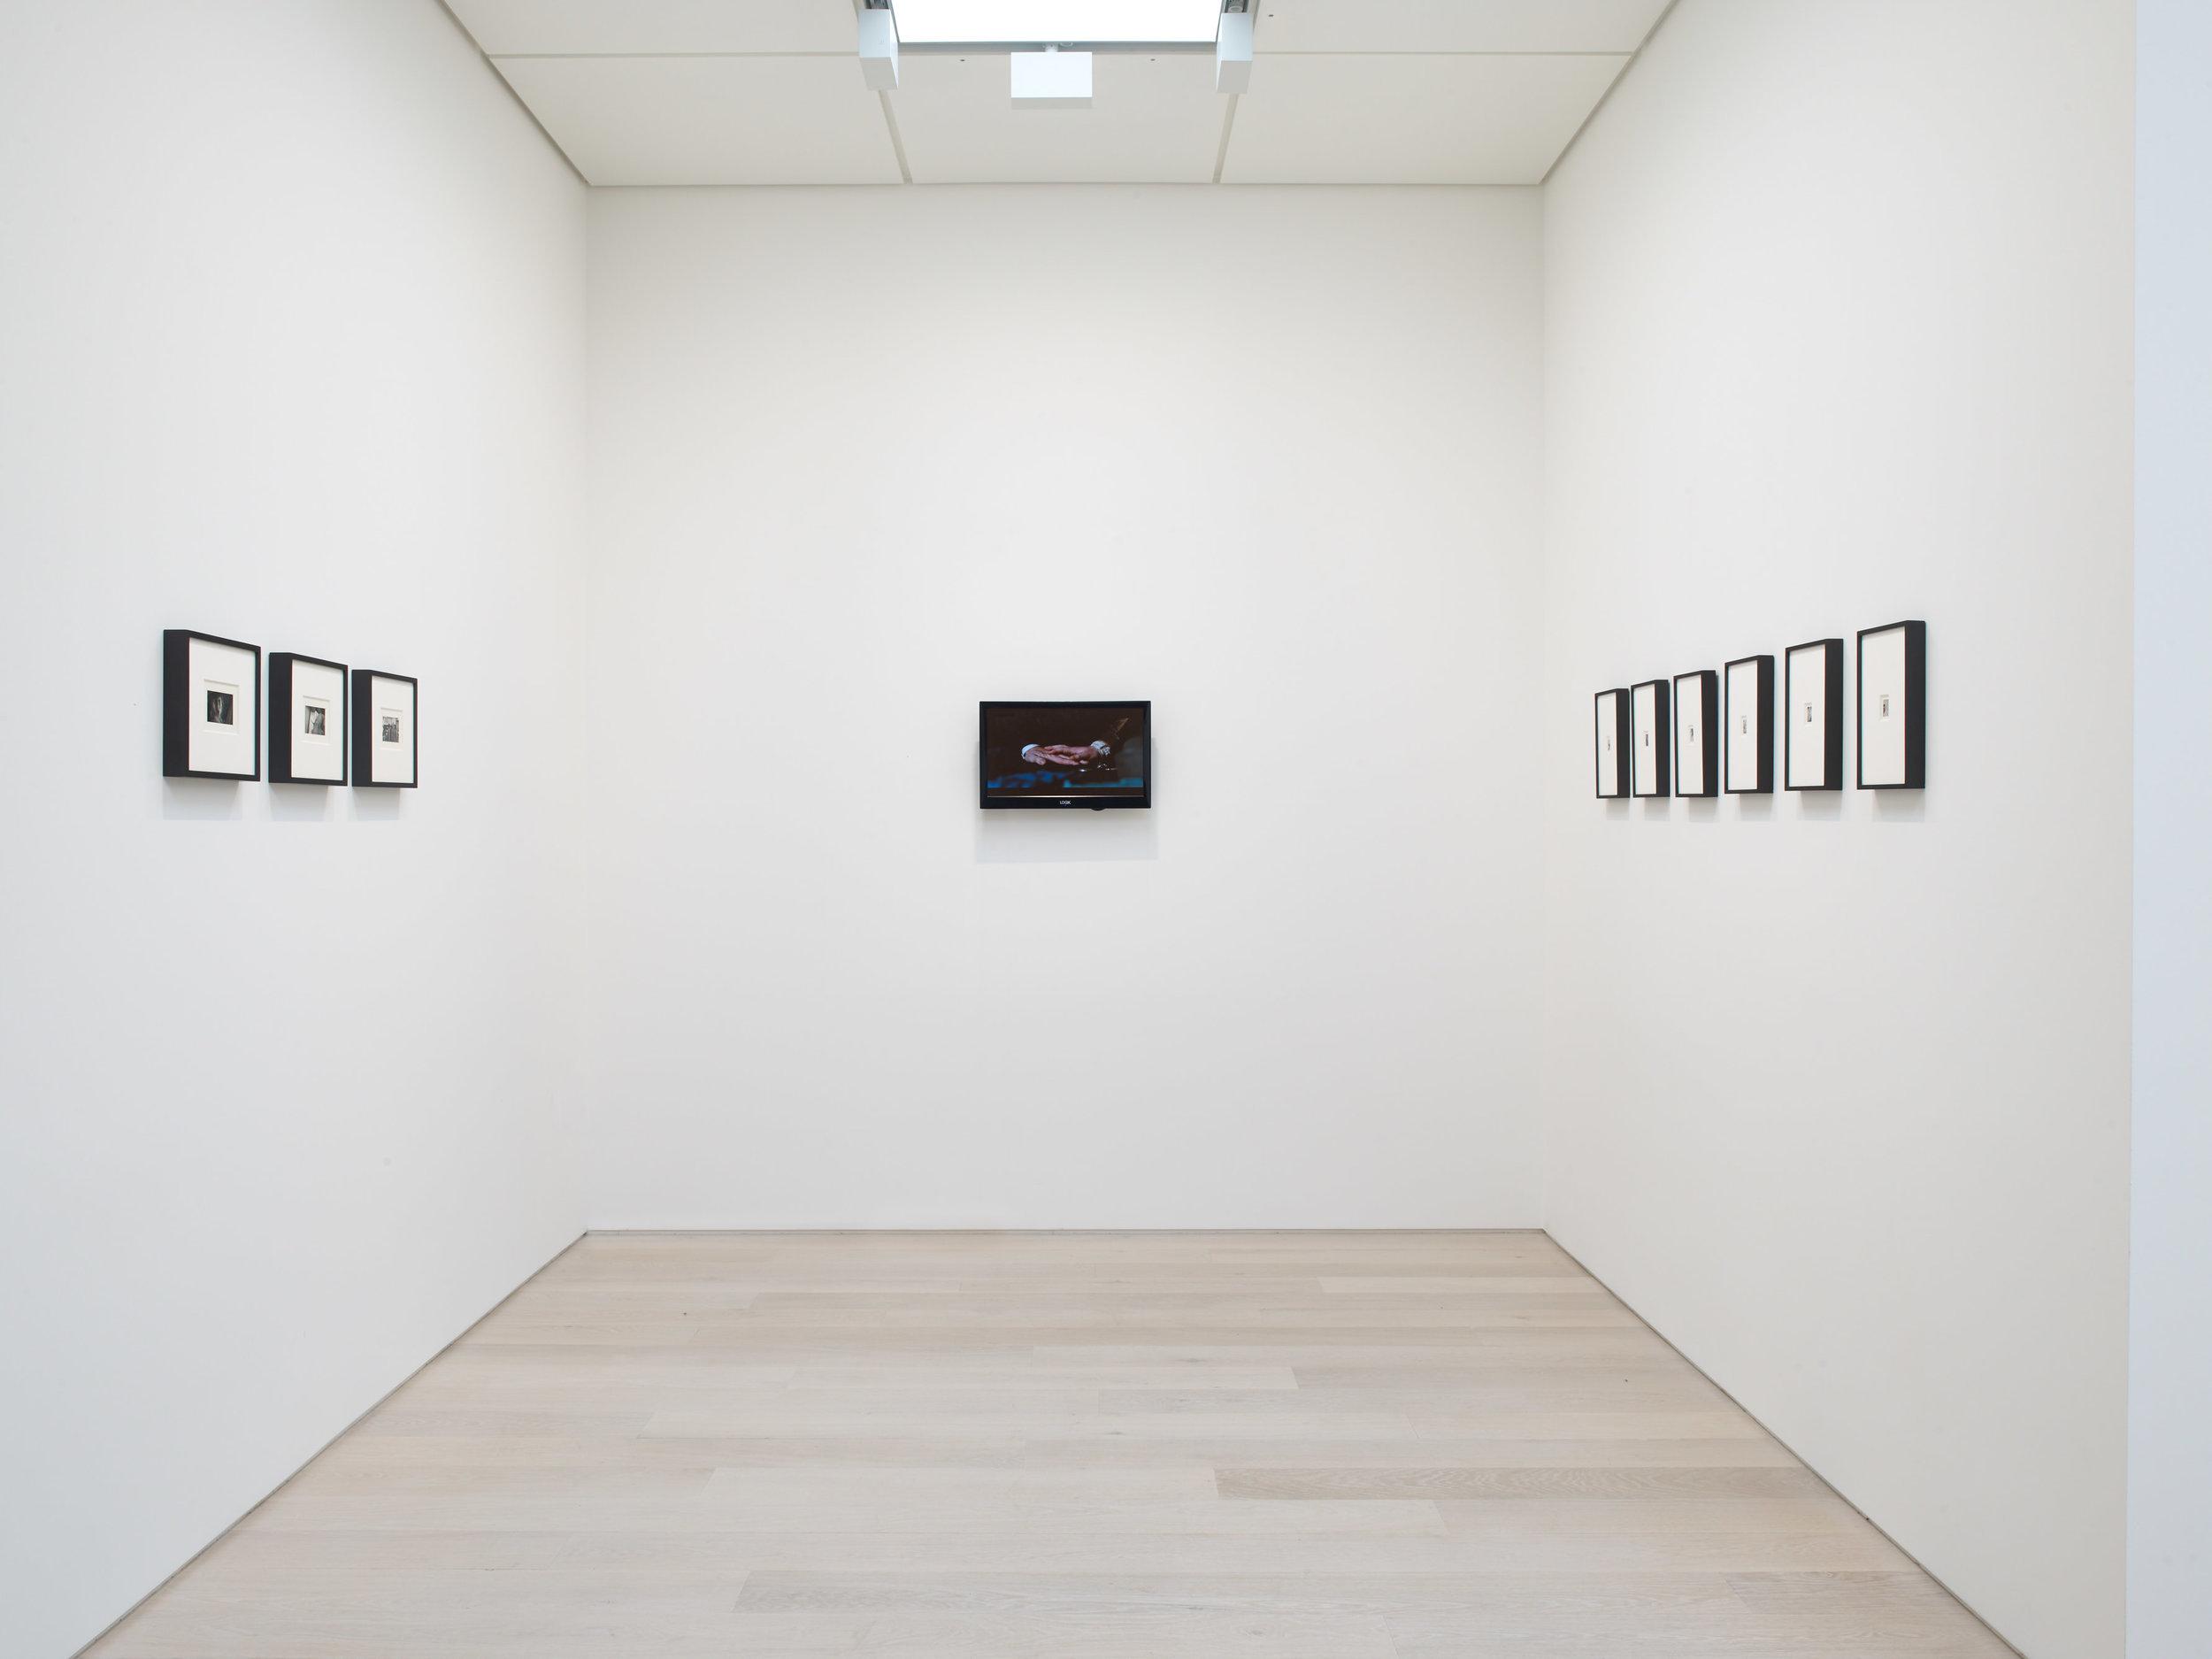 Marie Harnett_Still_Alan Cristea Gallery 2017 installation. Photo Stephe...-10.jpg